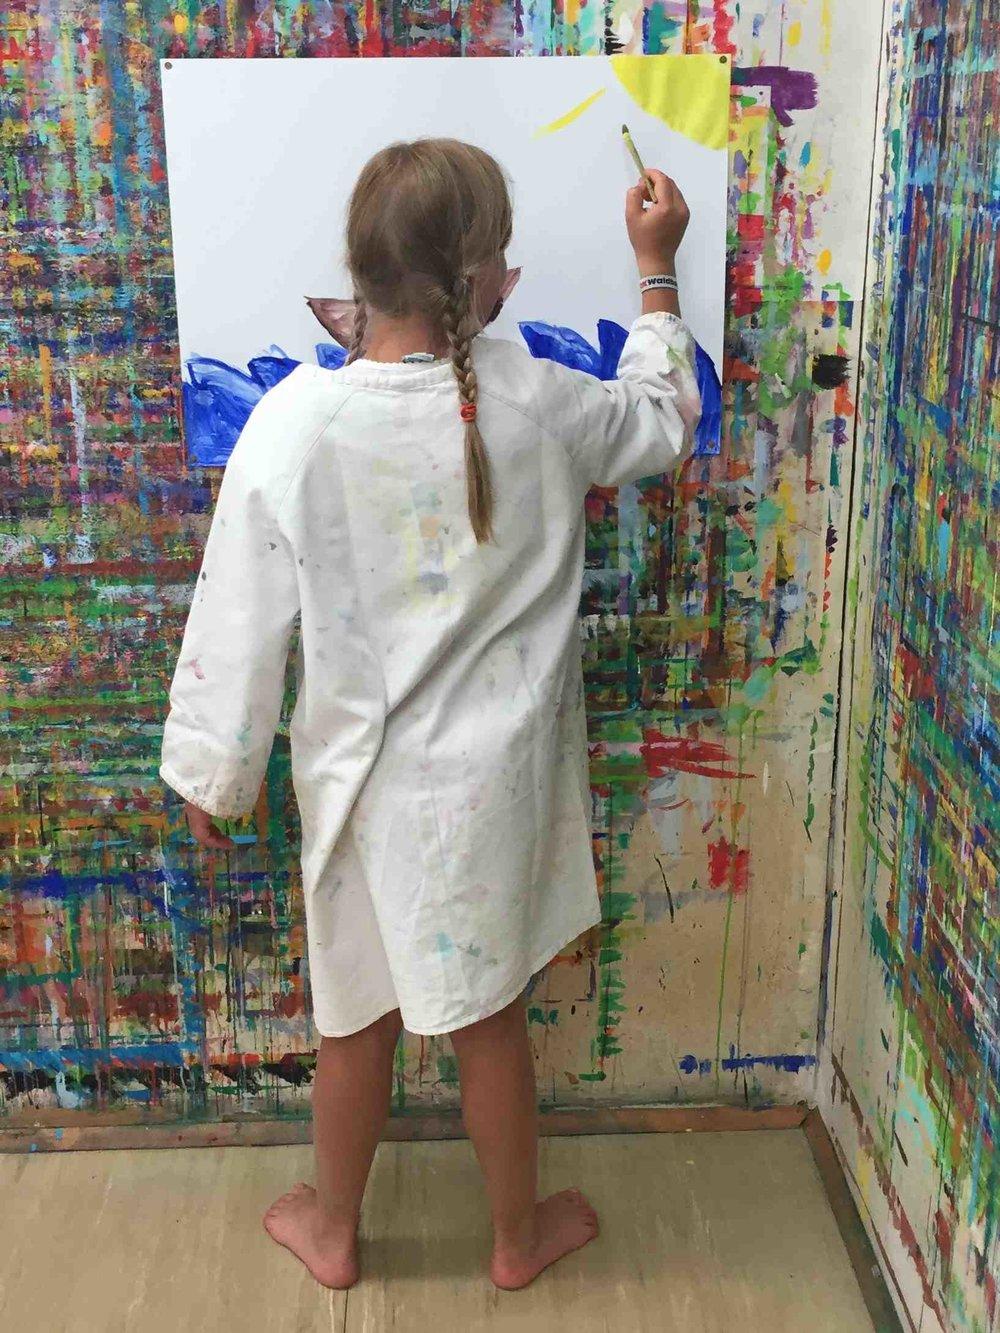 Jeder, er im Malort malt, hinterlässt Spuren an der Wand.